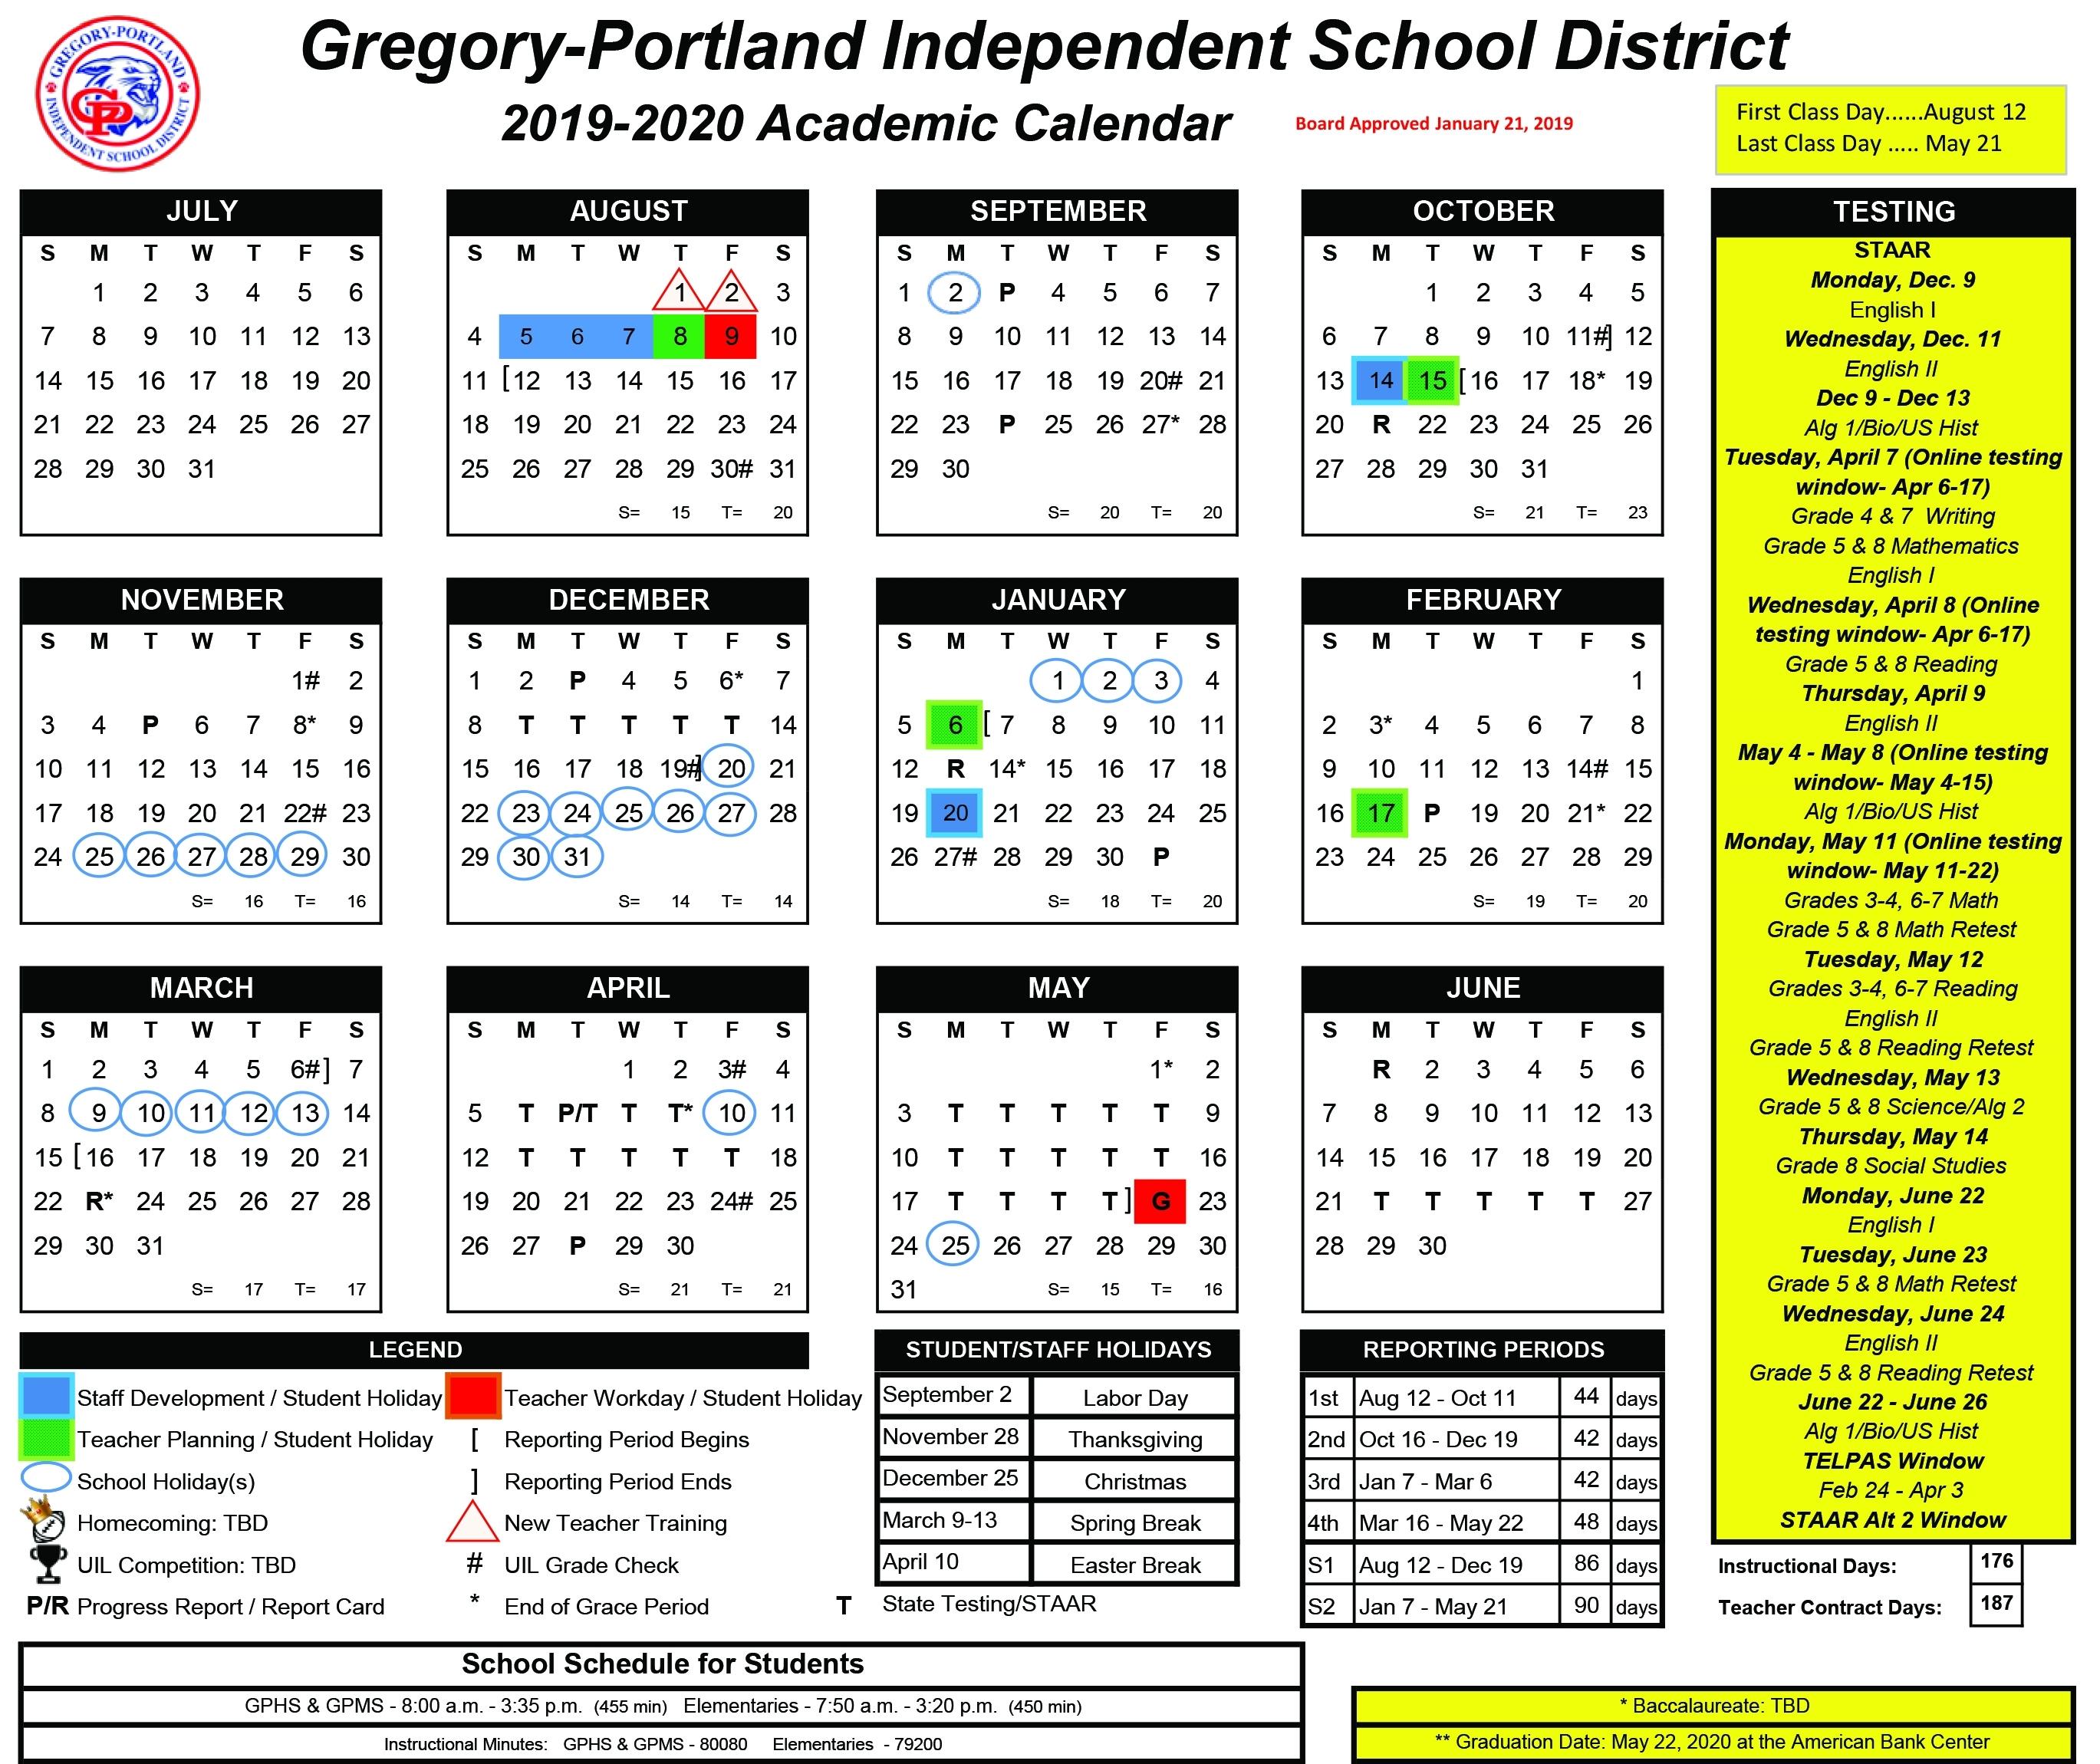 District Calendar, 2019-20 - Gregory-Portland Independent School regarding Pshe Special Days Calender 2020